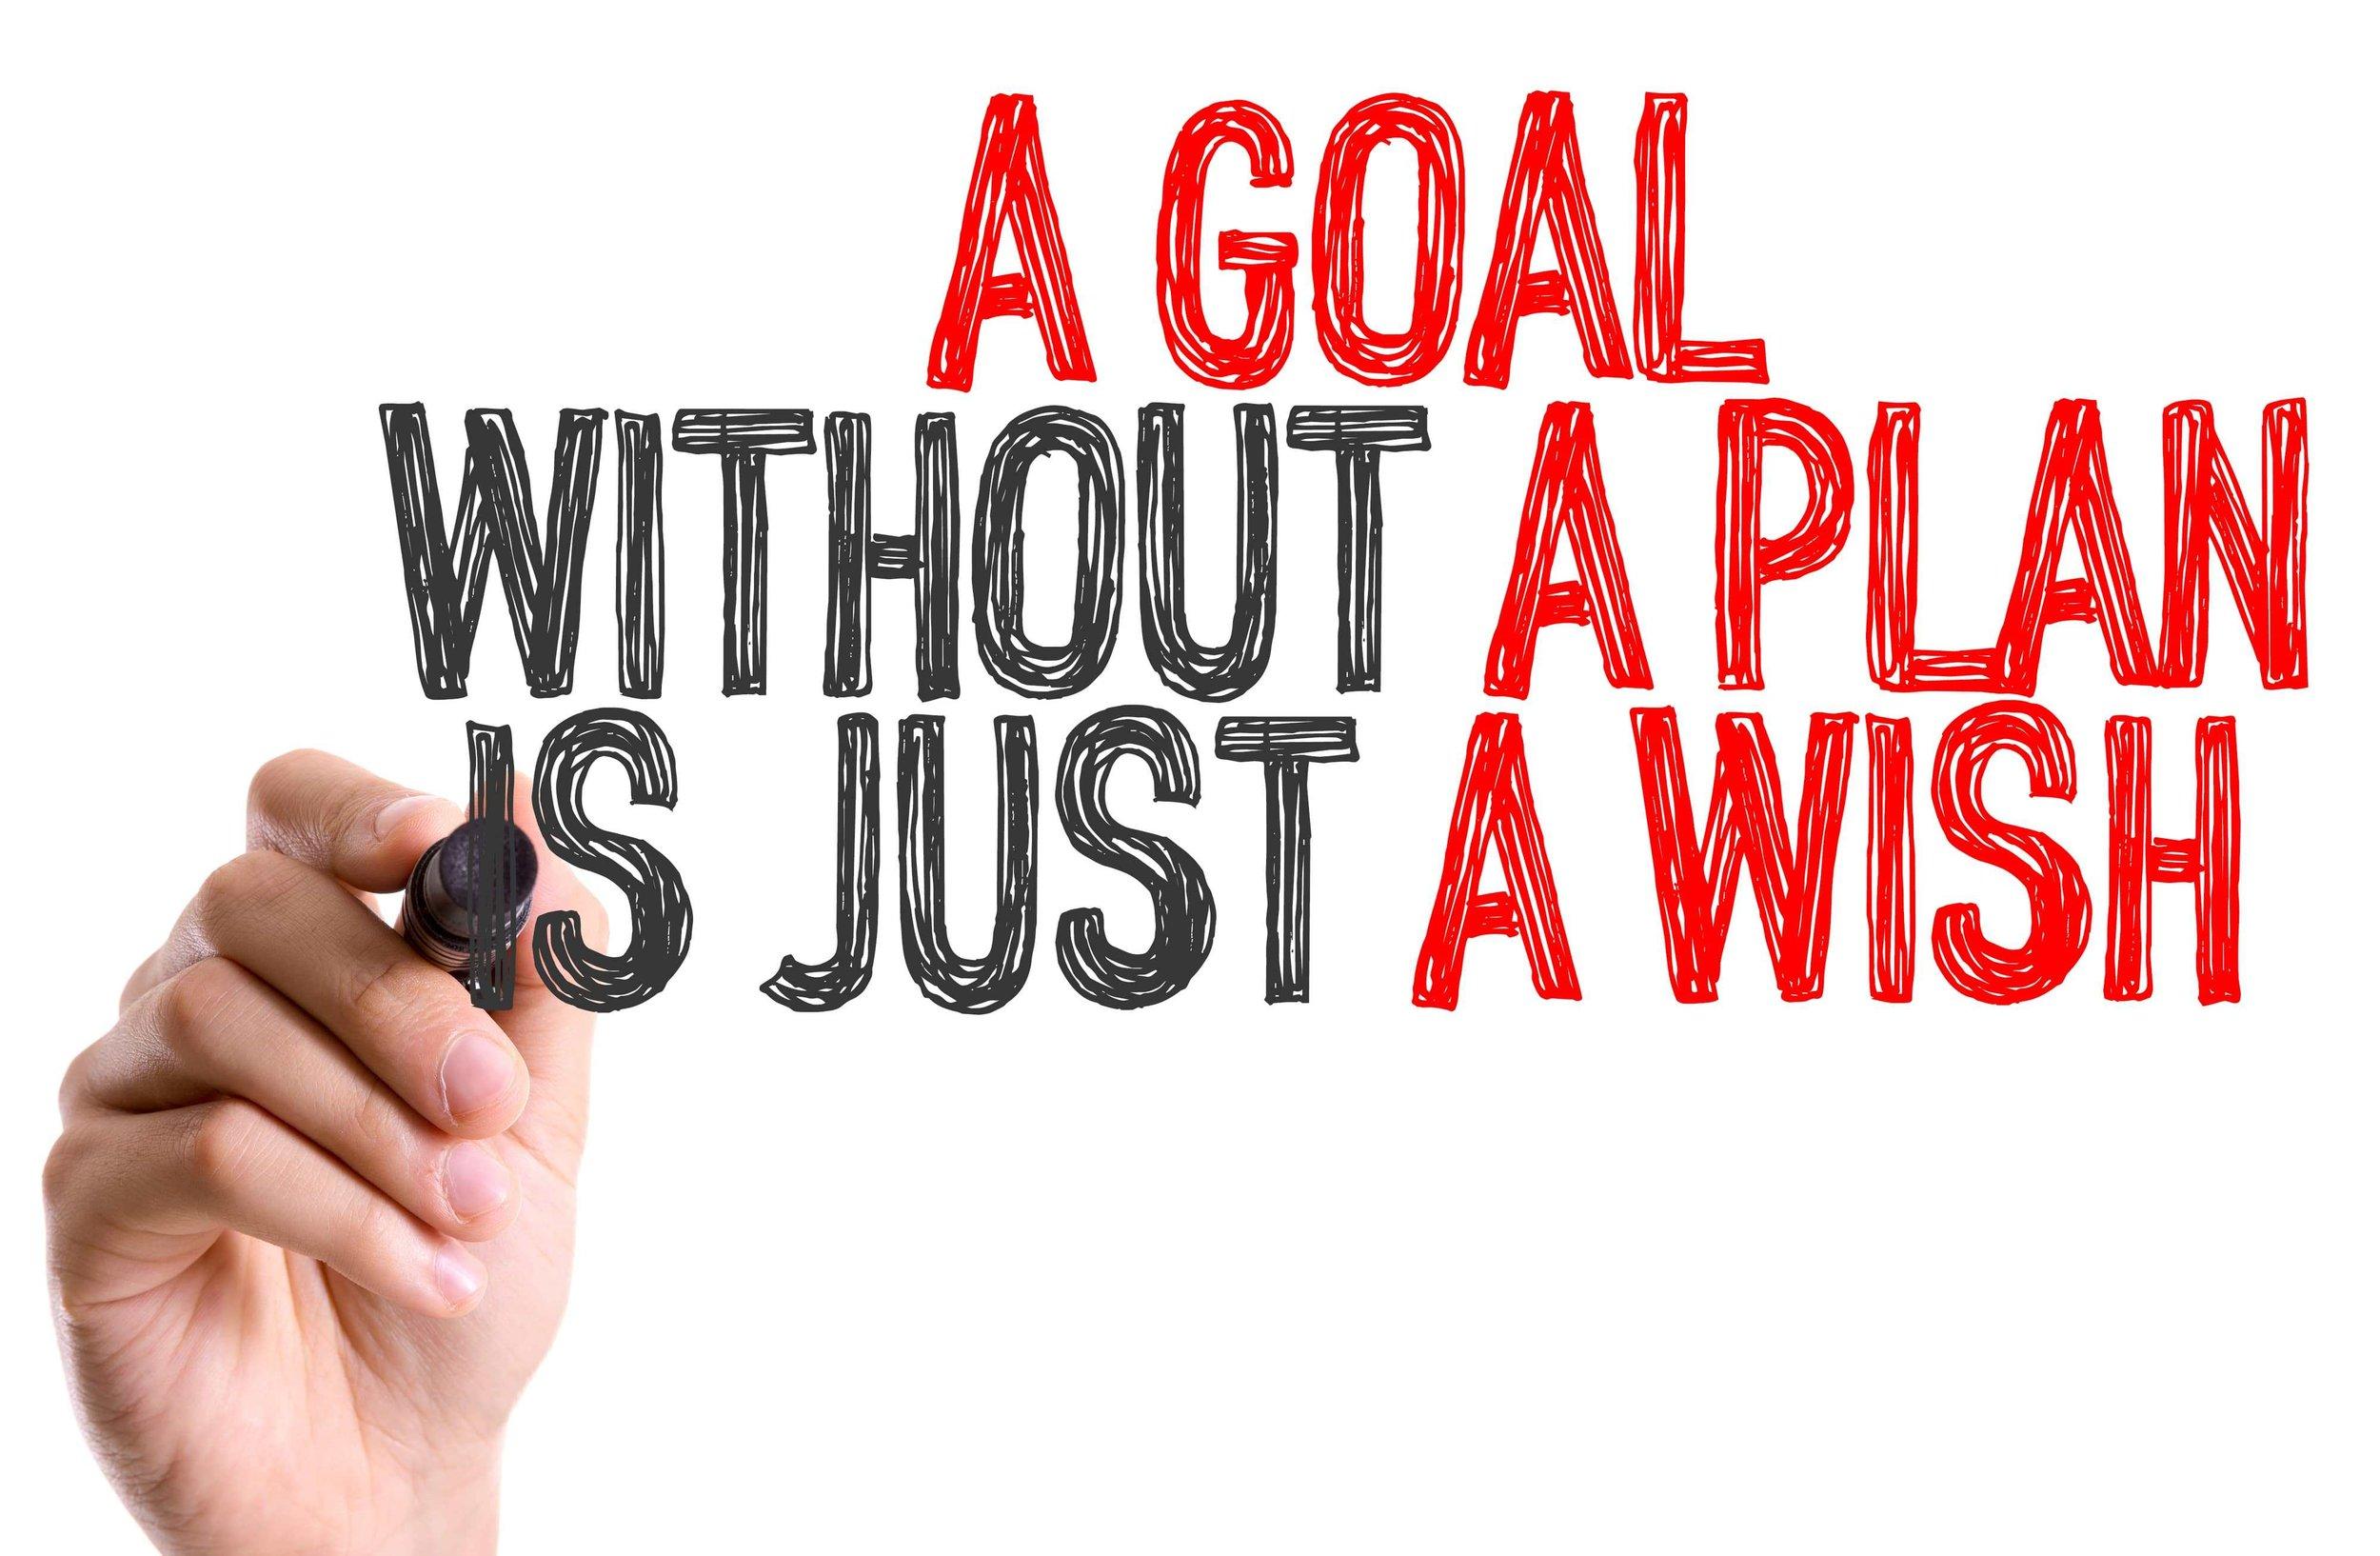 Goal-wo-plan.jpg